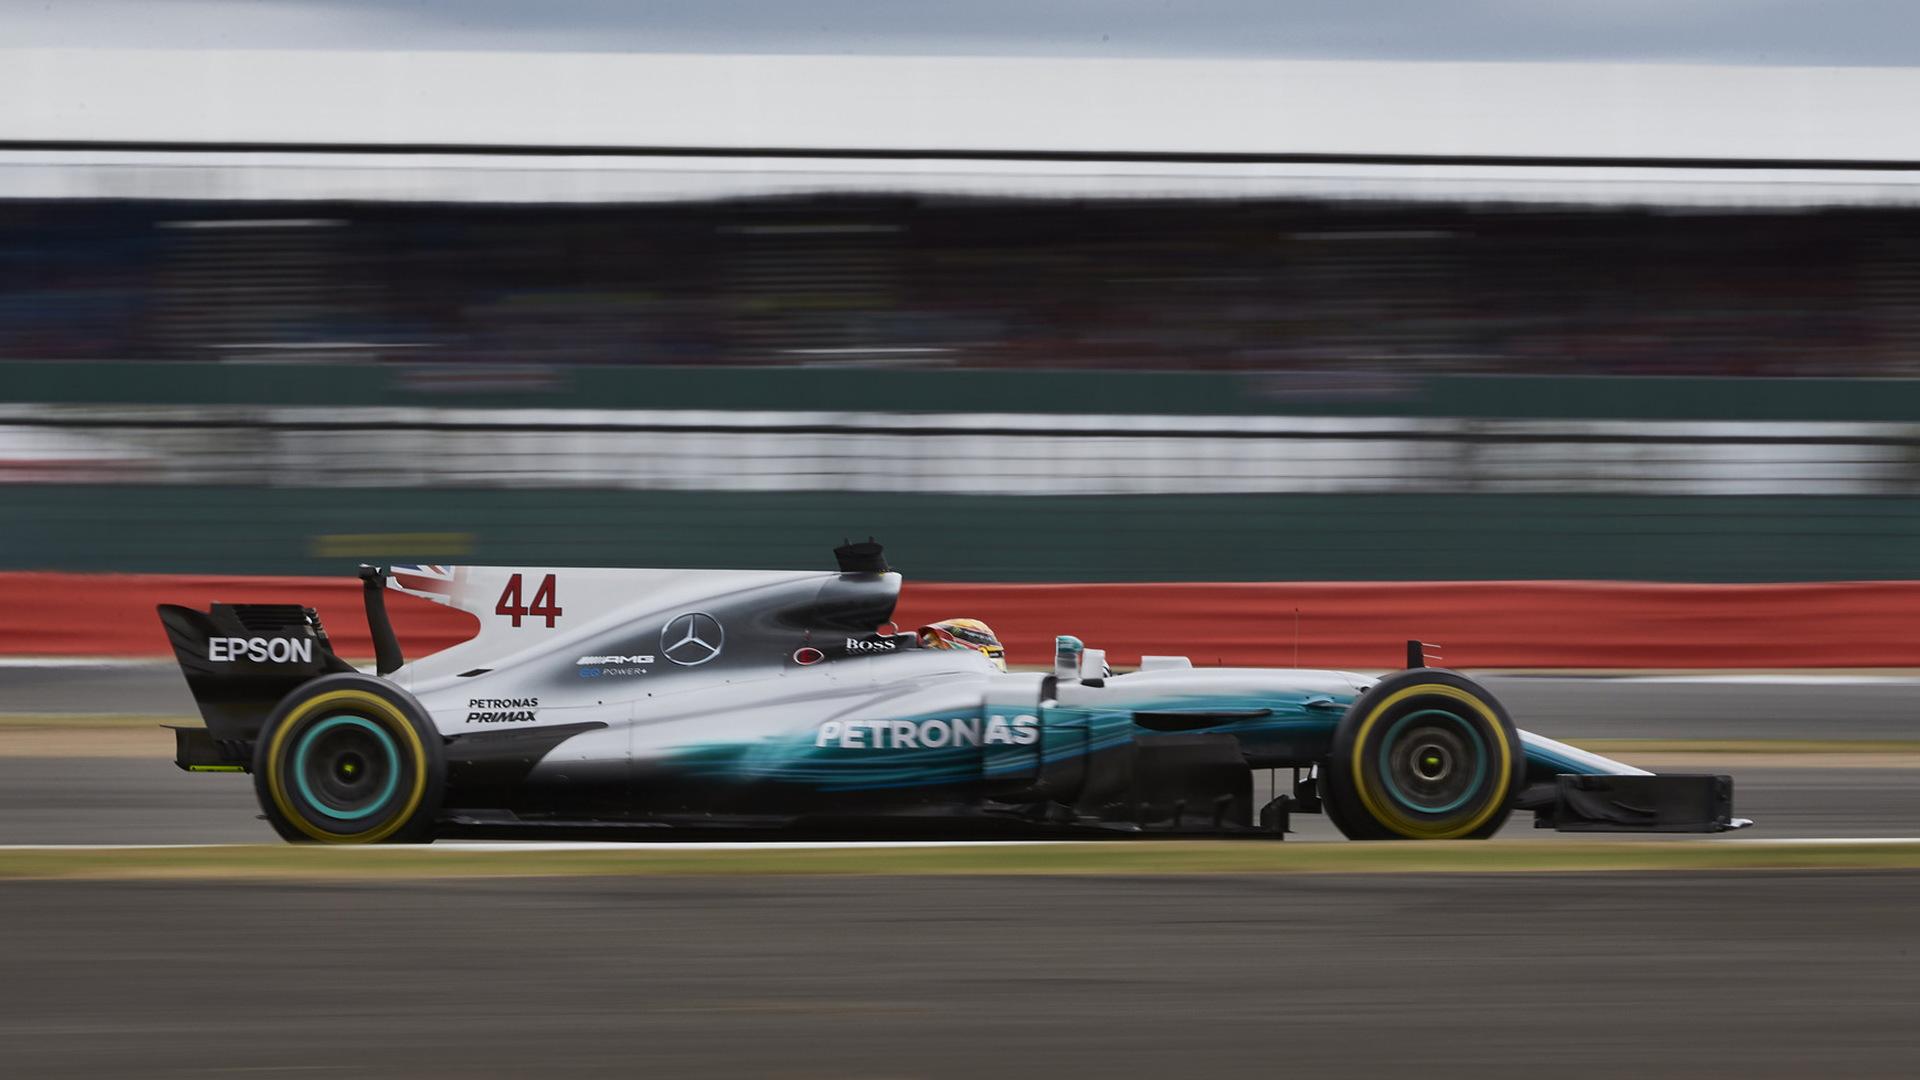 Mercedes AMG's Lewis Hamilton at the 2017 Formula One British Grand Prix